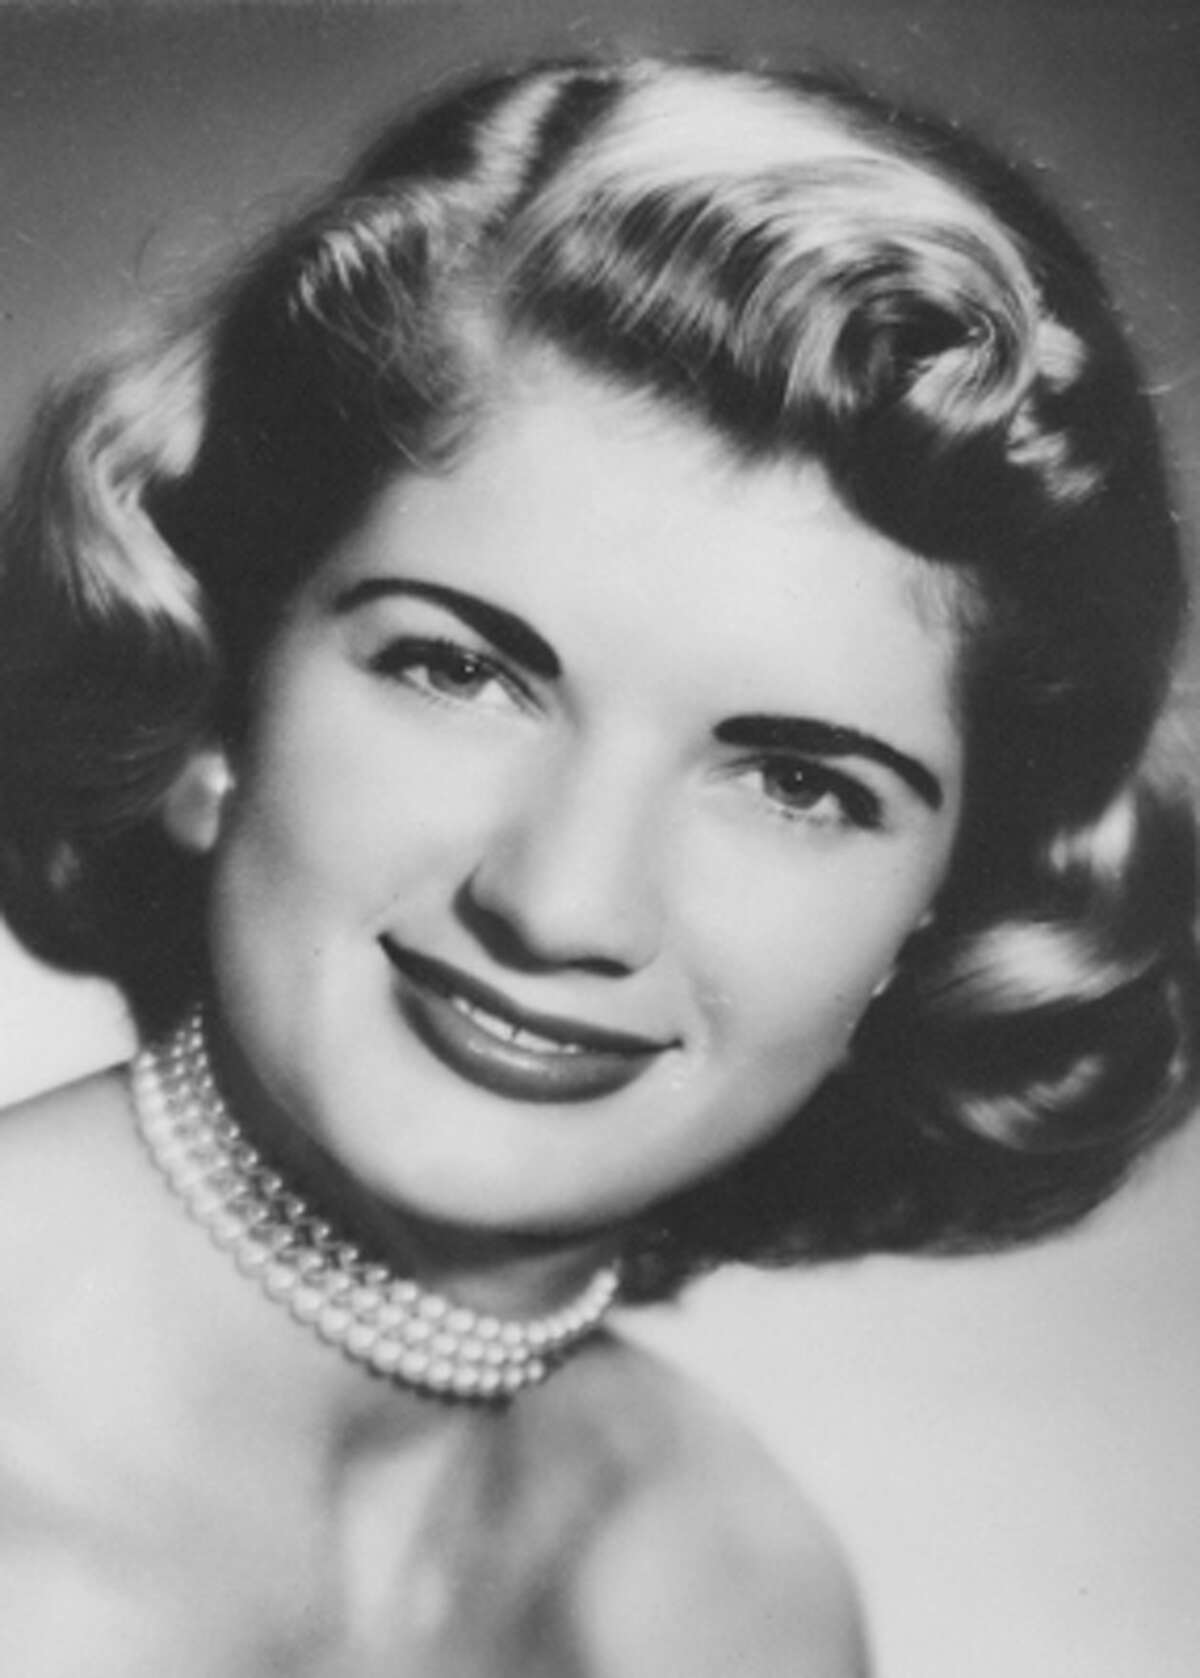 June Prichard, Miss Texas 1955